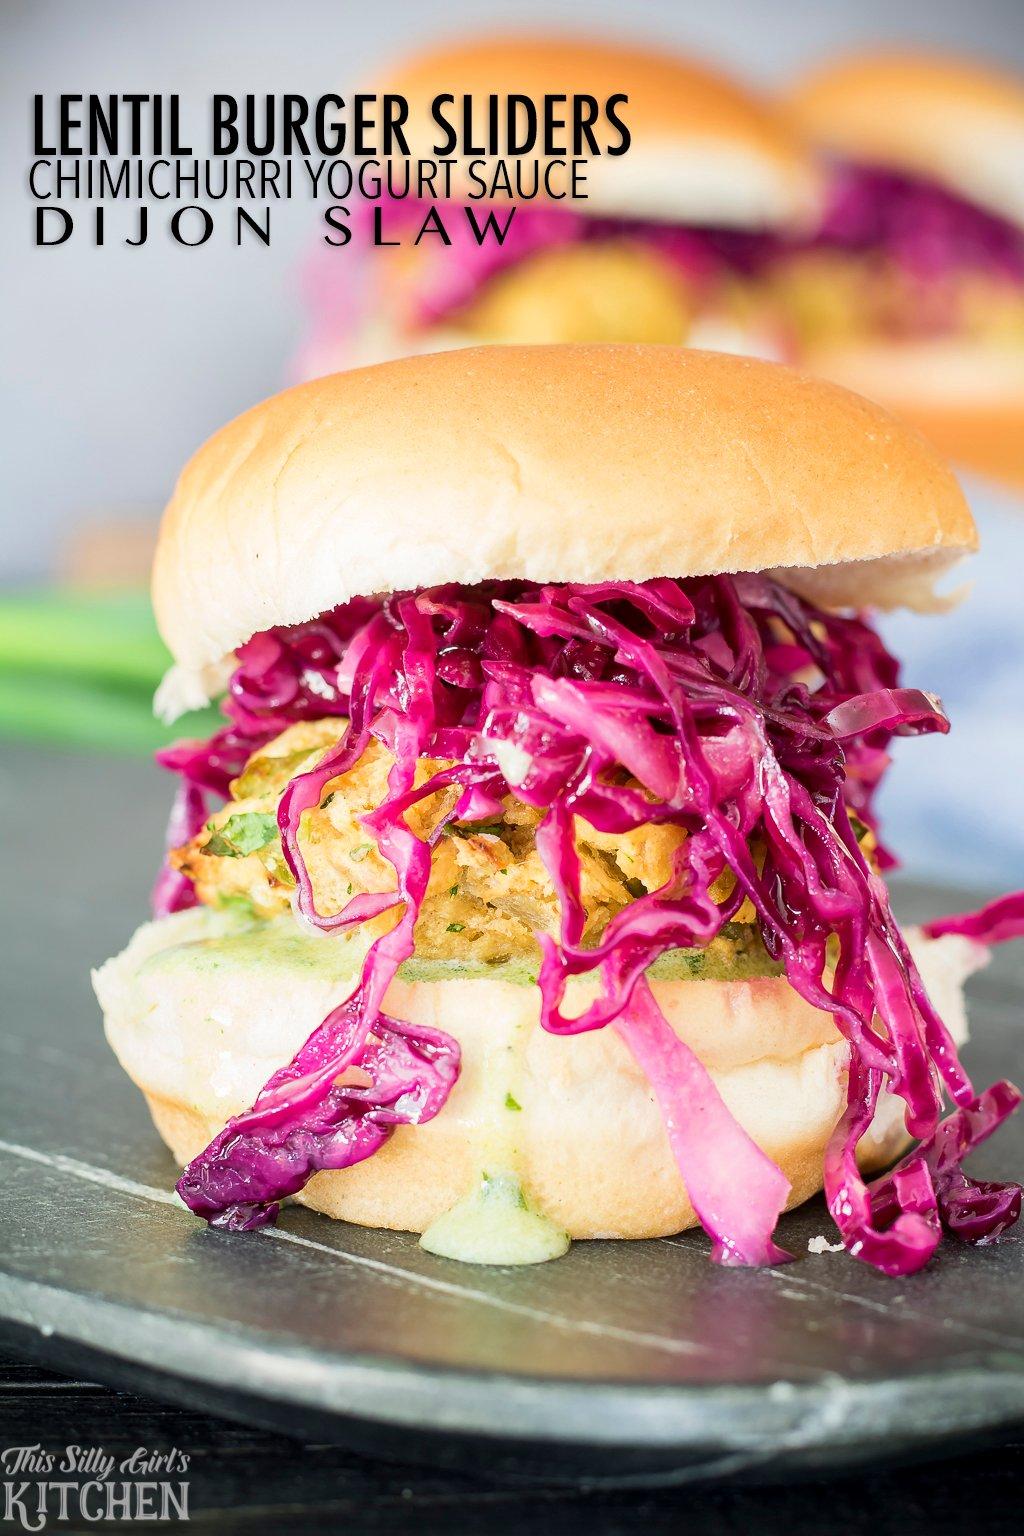 Lentil Burger Sliders with chimichurri yogurt sauce and dijon slaw, yum! Recipe from ThisSillyGirlsKitchen.com